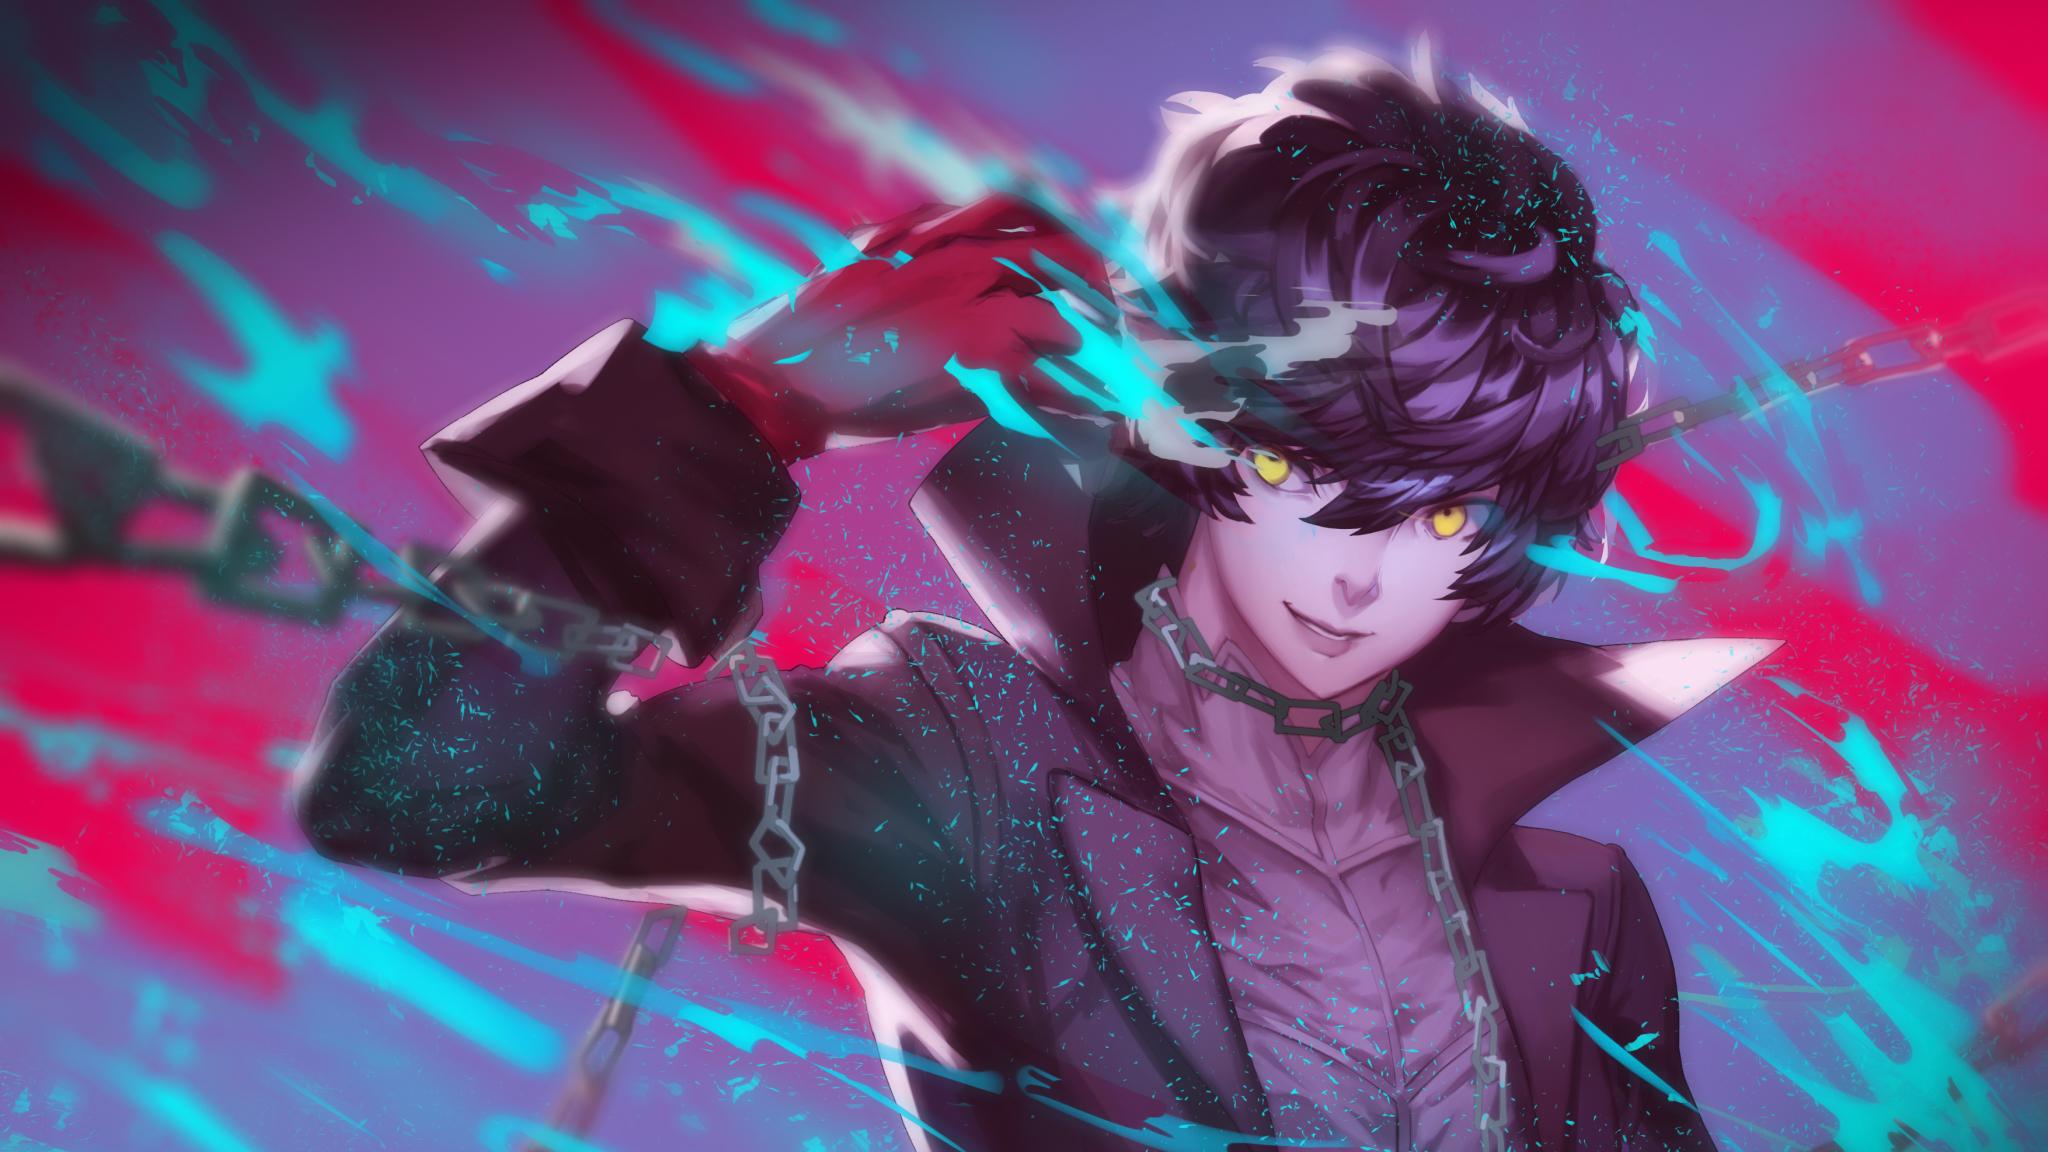 Persona 5 Akira Kurusu Joker Hd 4k Wallpaper